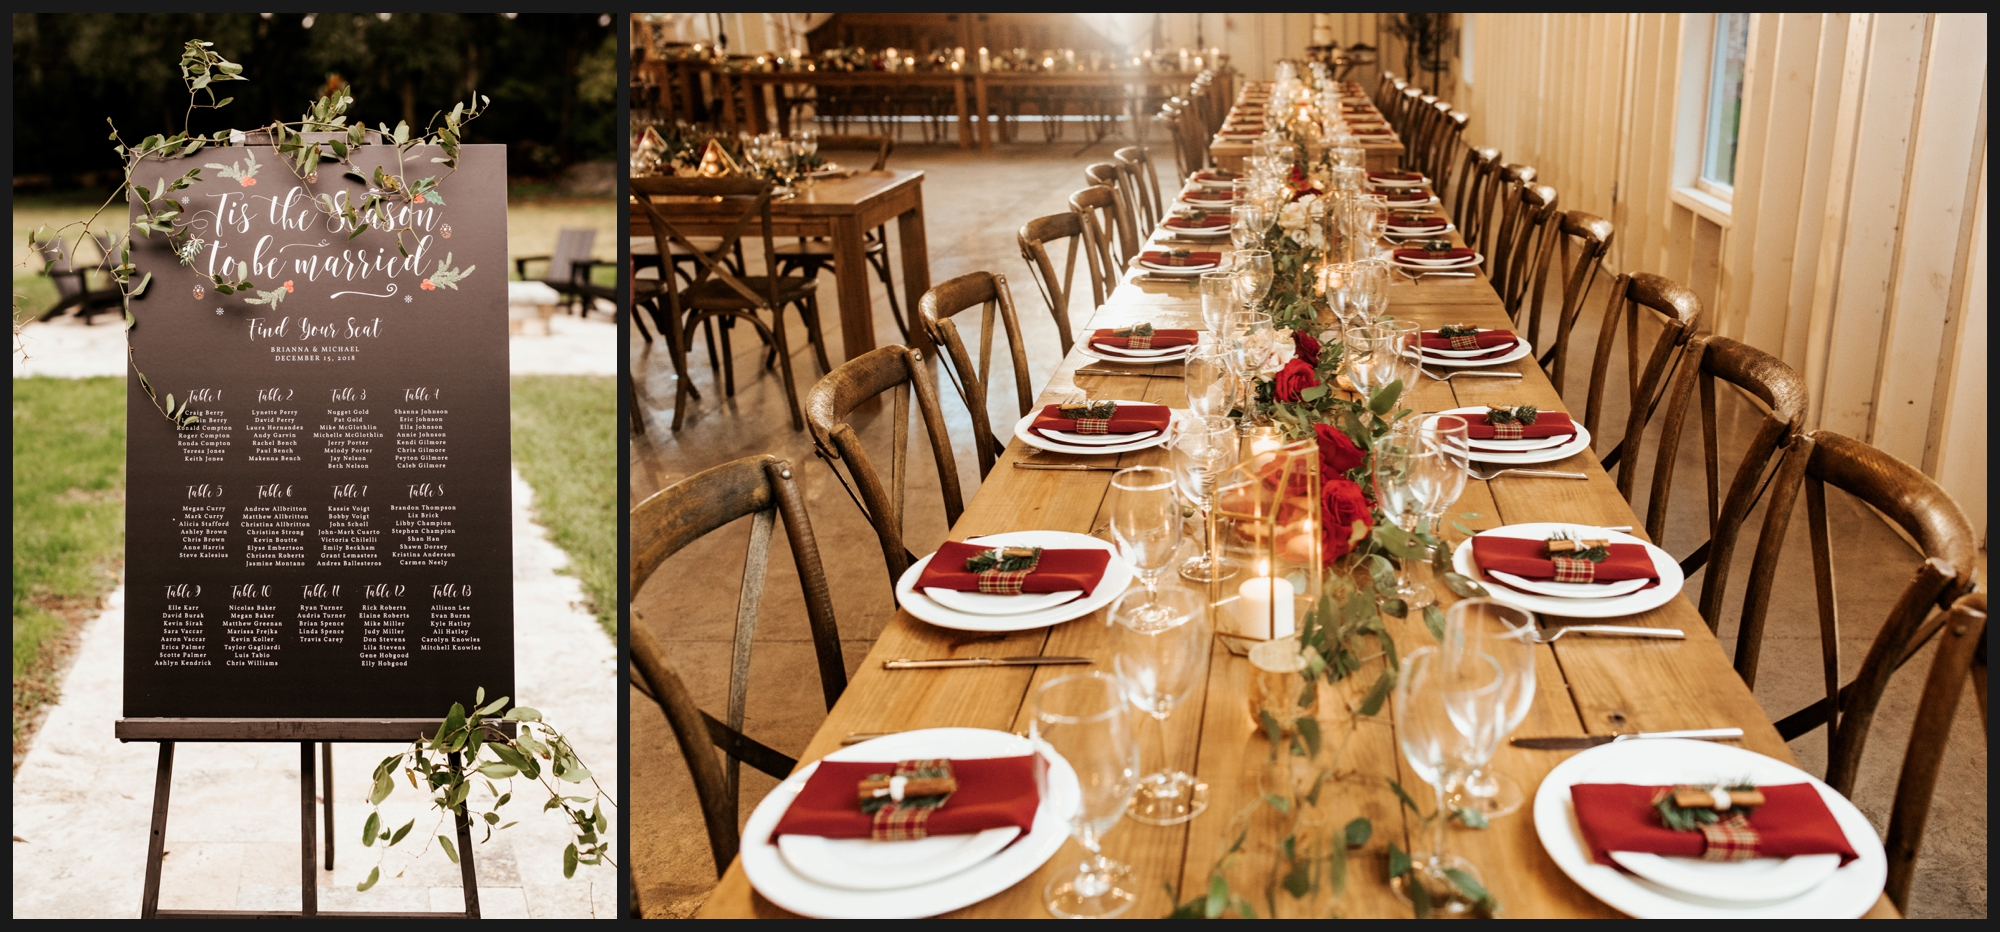 Orlando-Wedding-Photographer-destination-wedding-photographer-florida-wedding-photographer-hawaii-wedding-photographer_0482.jpg